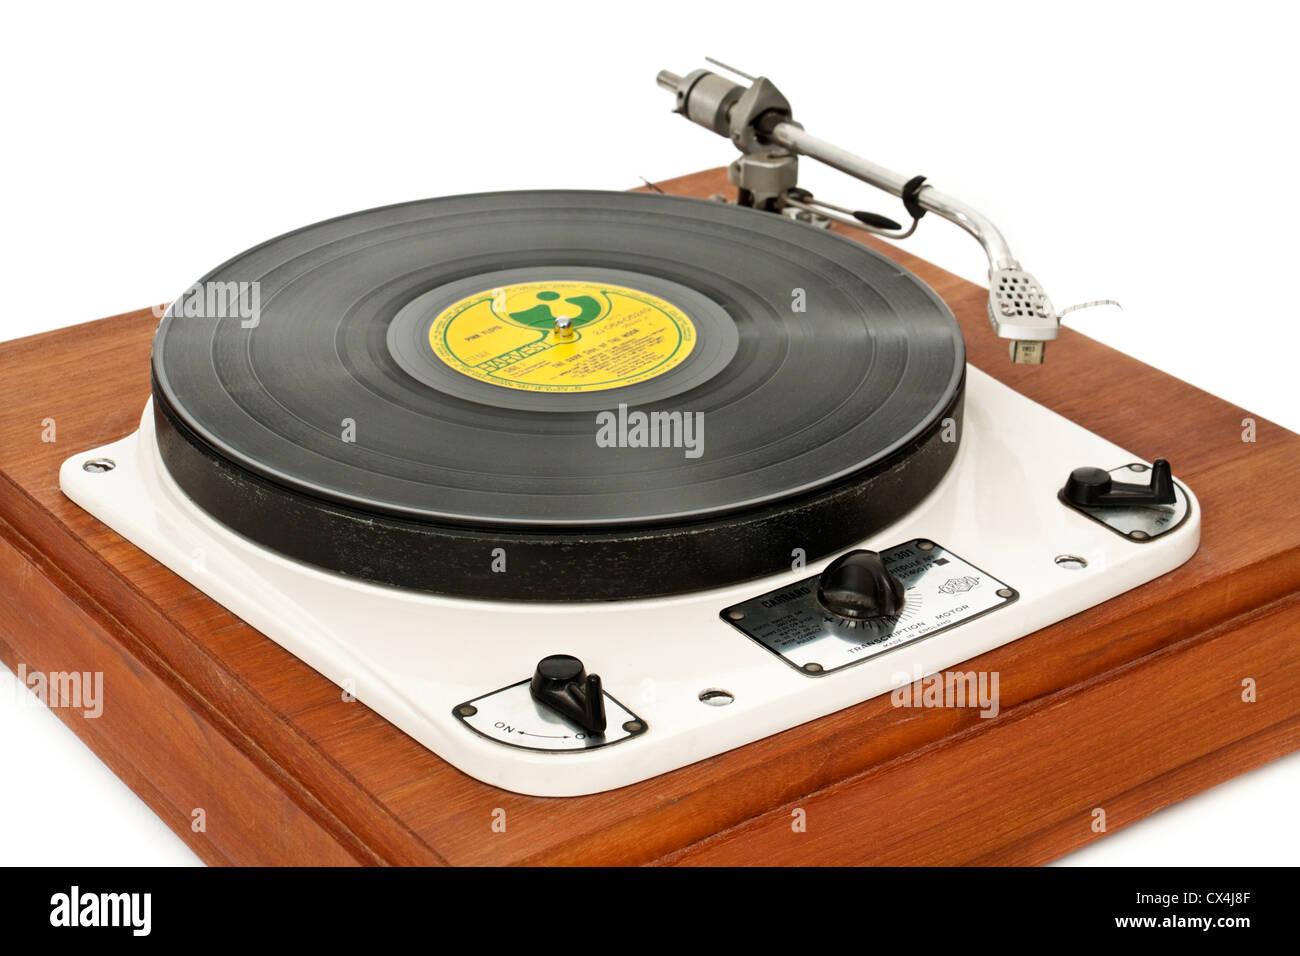 Vintage 1950's Garrard 301 turntable with transcription